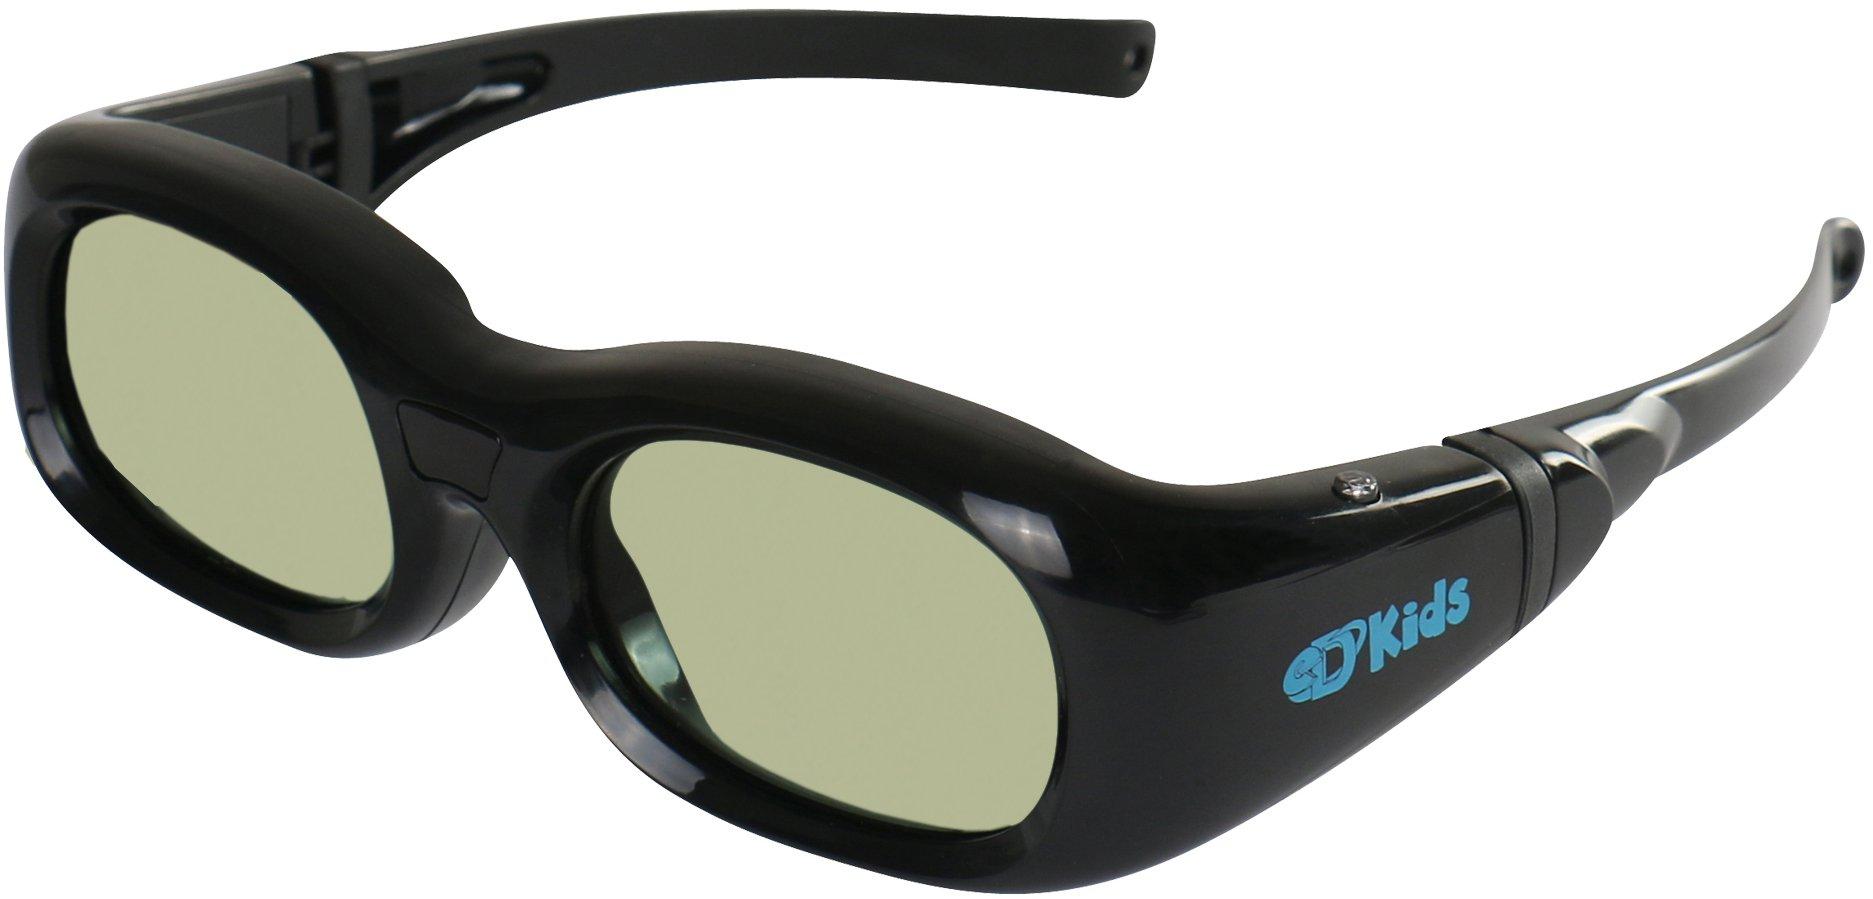 KIDS CHILDREN'S SAMSUNG Compatible eDimensional RECHARGEABLE 3D Glasses for 2011-16 Bluetooth 3D TV's